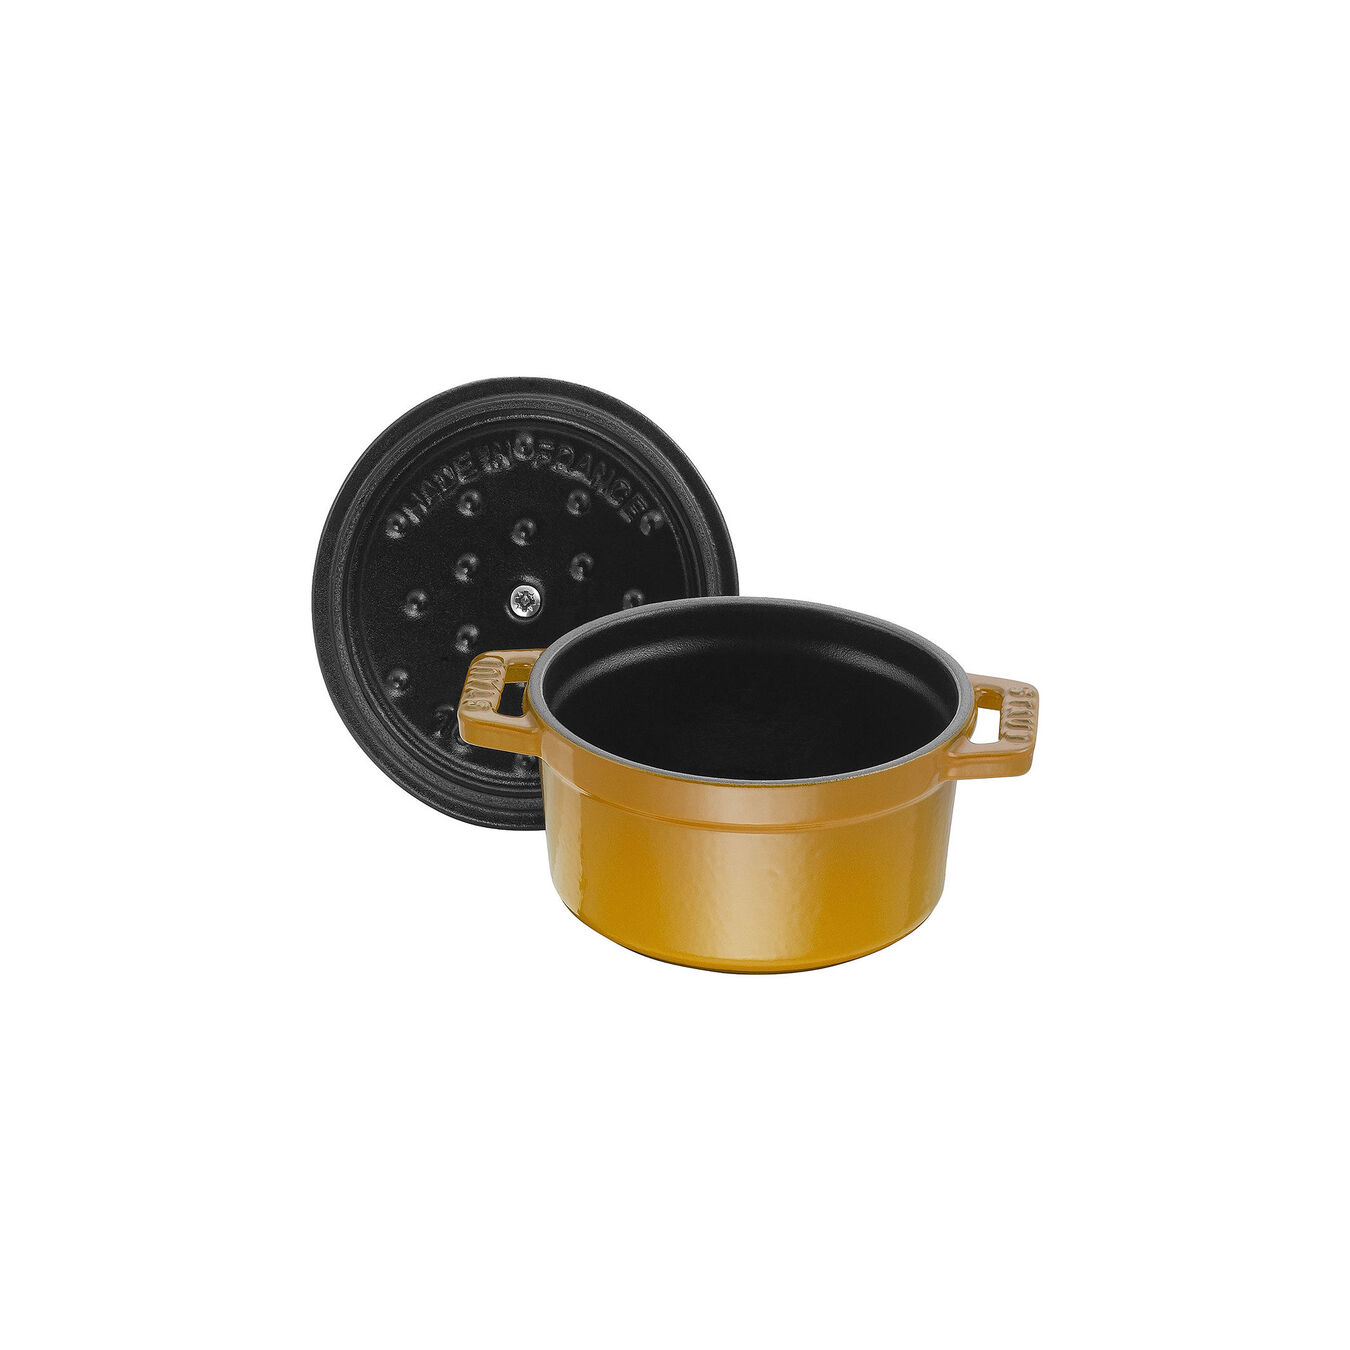 Mini Cocotte 10 cm, rund, Senf, Gusseisen,,large 5